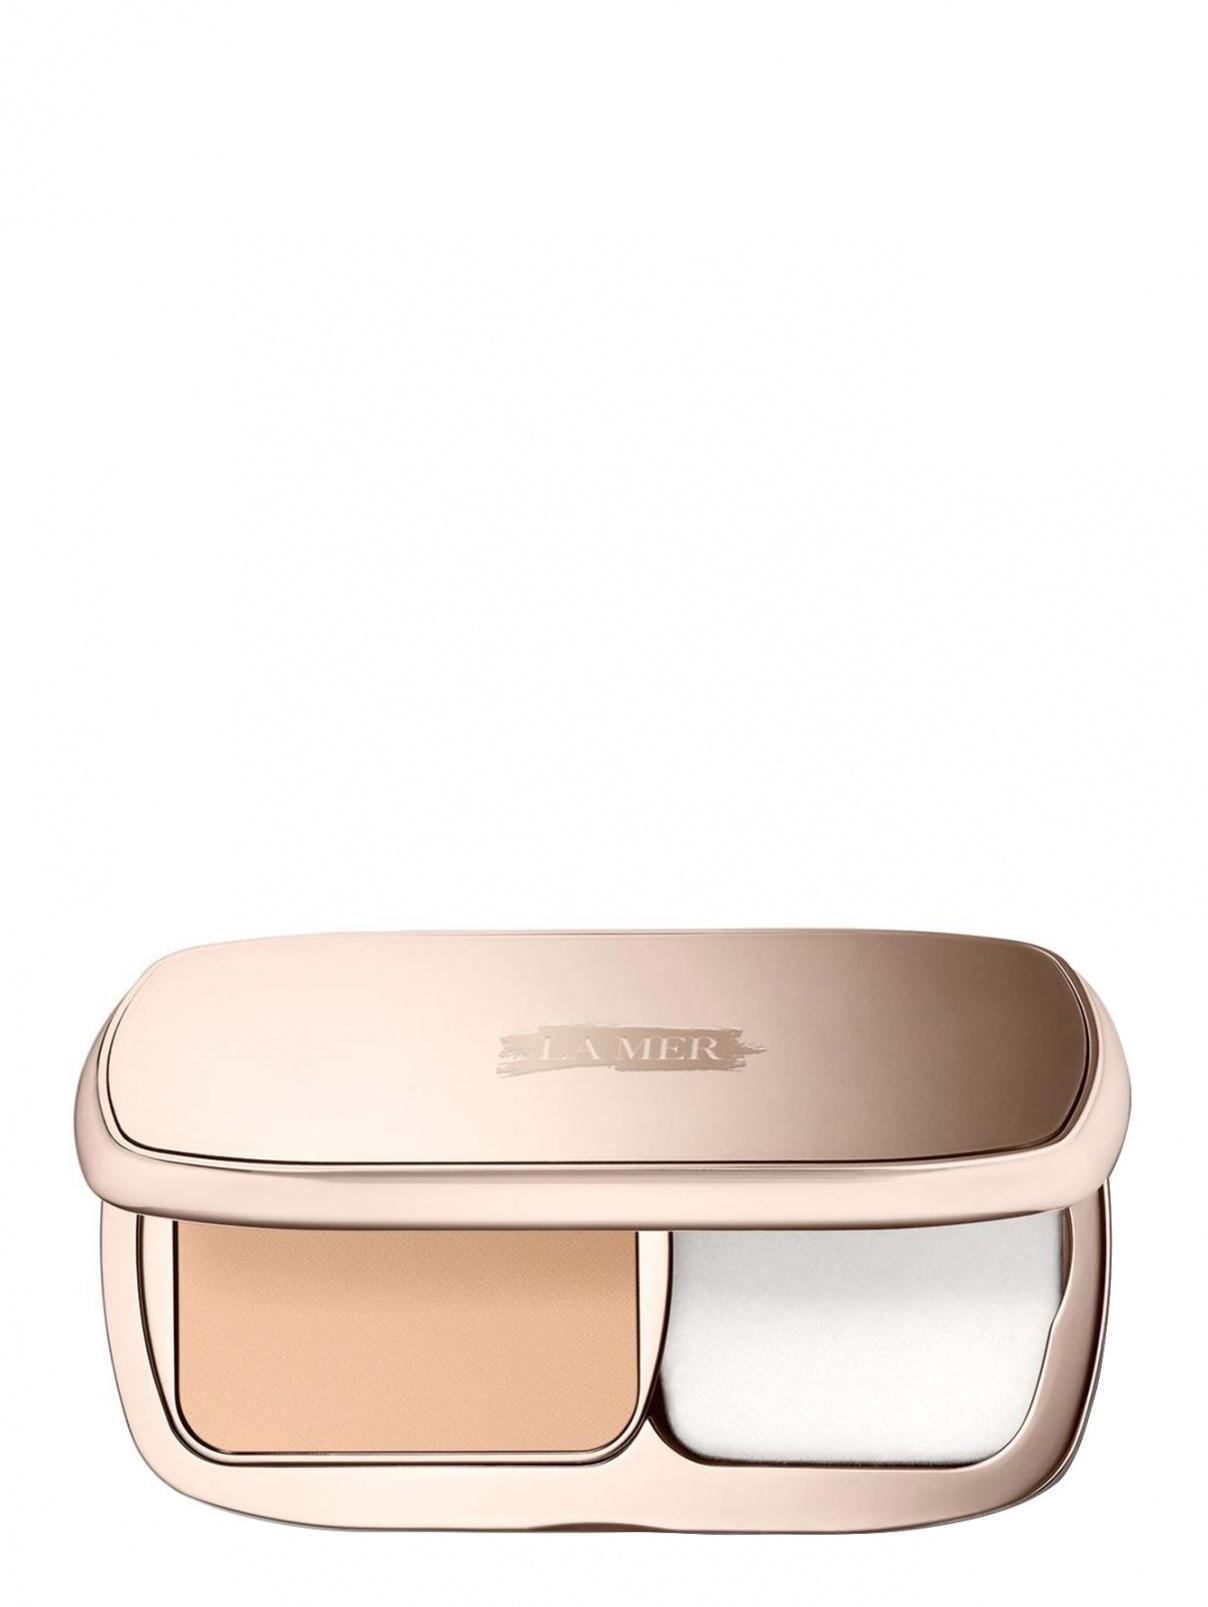 Компактная пудра-основа The Soft Moisture Powder, Pearl, SPF 30, 9,5 г La Mer  –  Общий вид